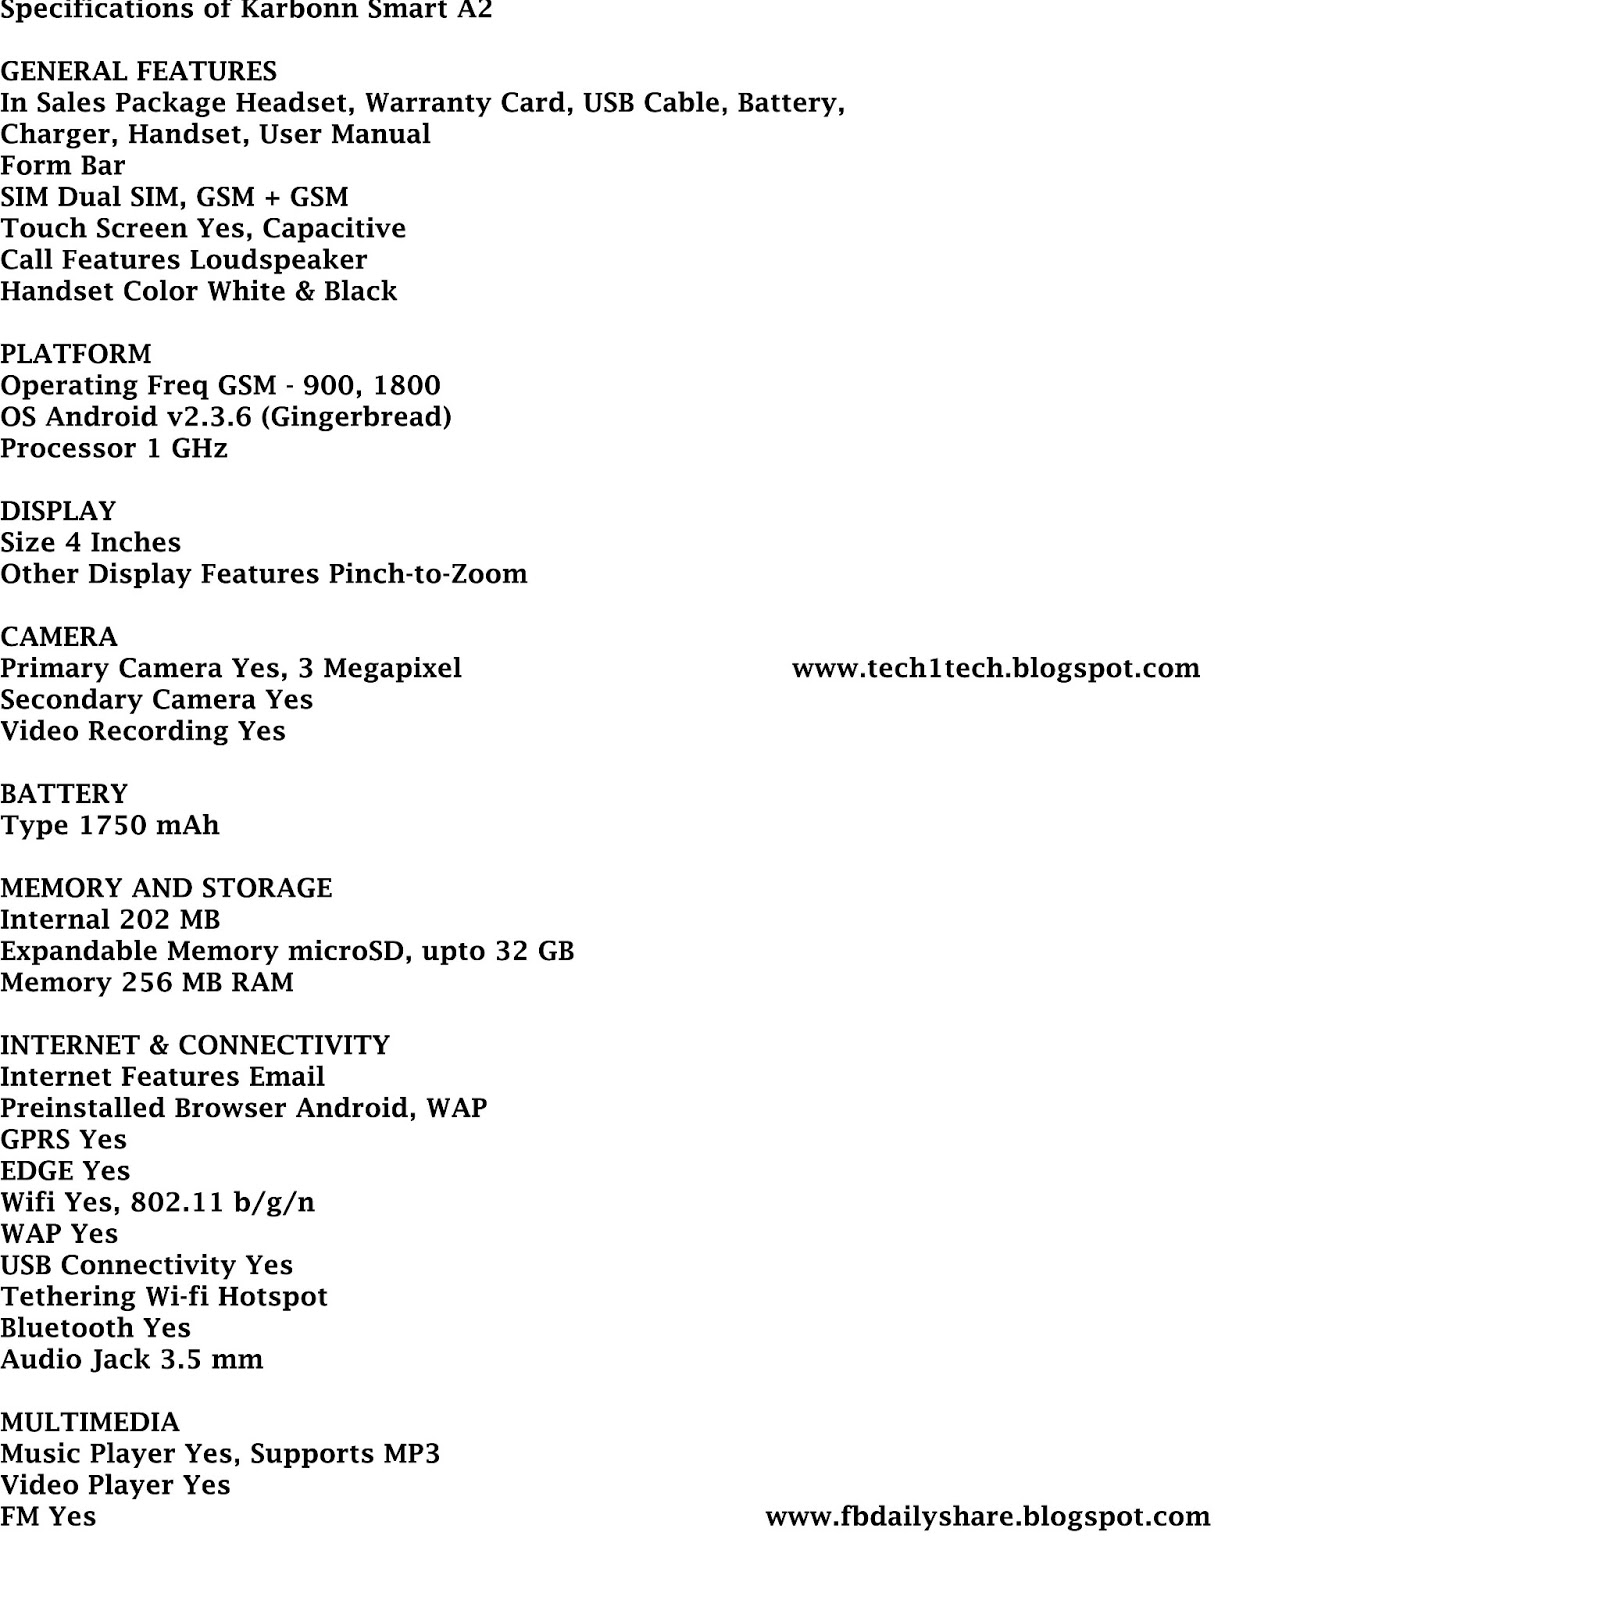 Samsung galaxy s duos s7562 full phone specifications - Karbonn Smart A2 Full Phone Specifications